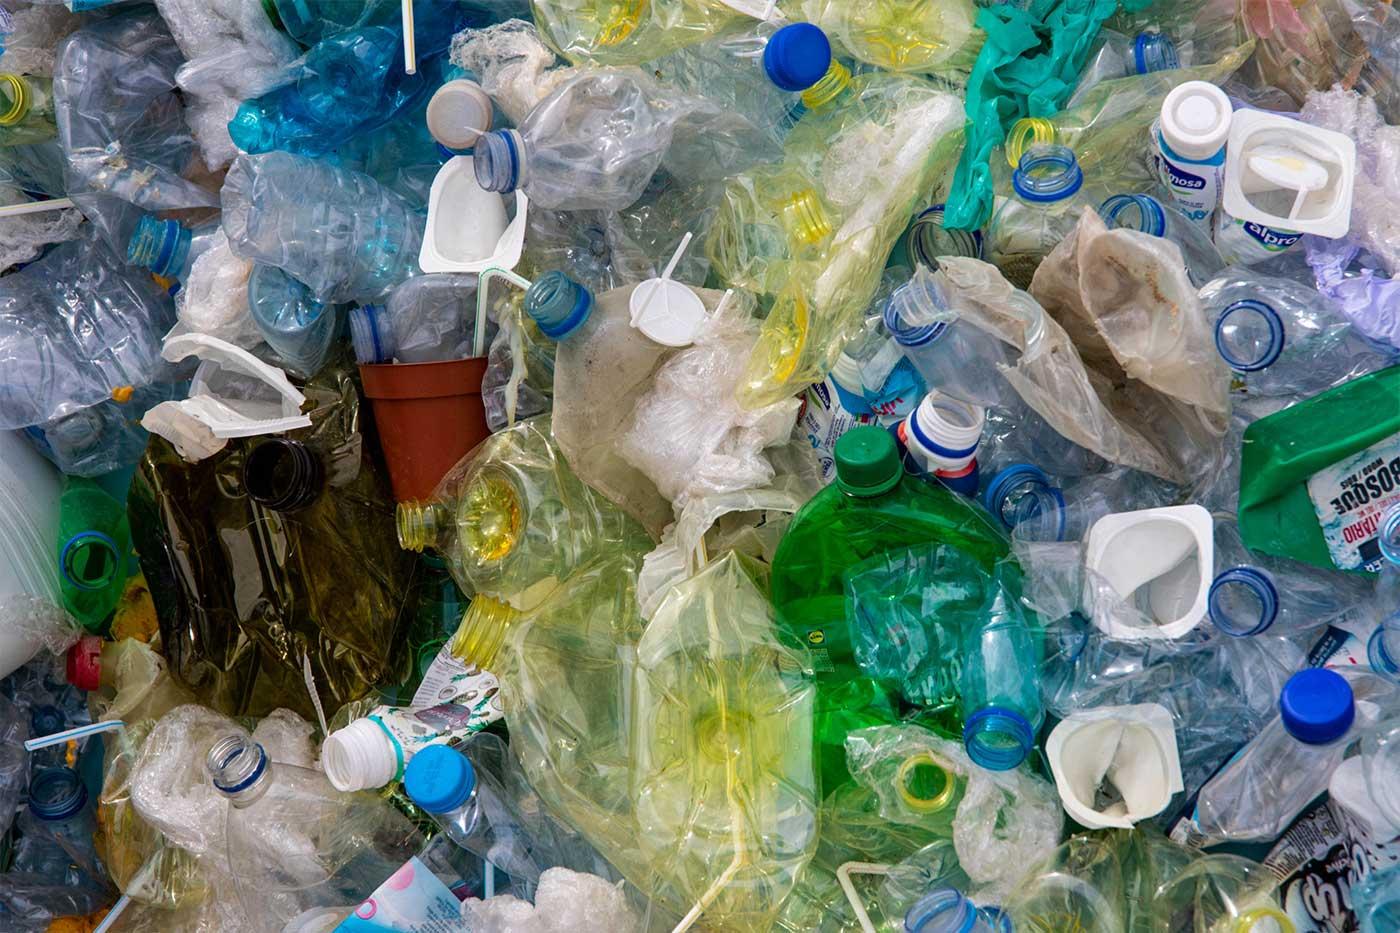 P&G, Unilever & Colgate-Palmolive efforts fall short in plastic pollution September 25, 2020